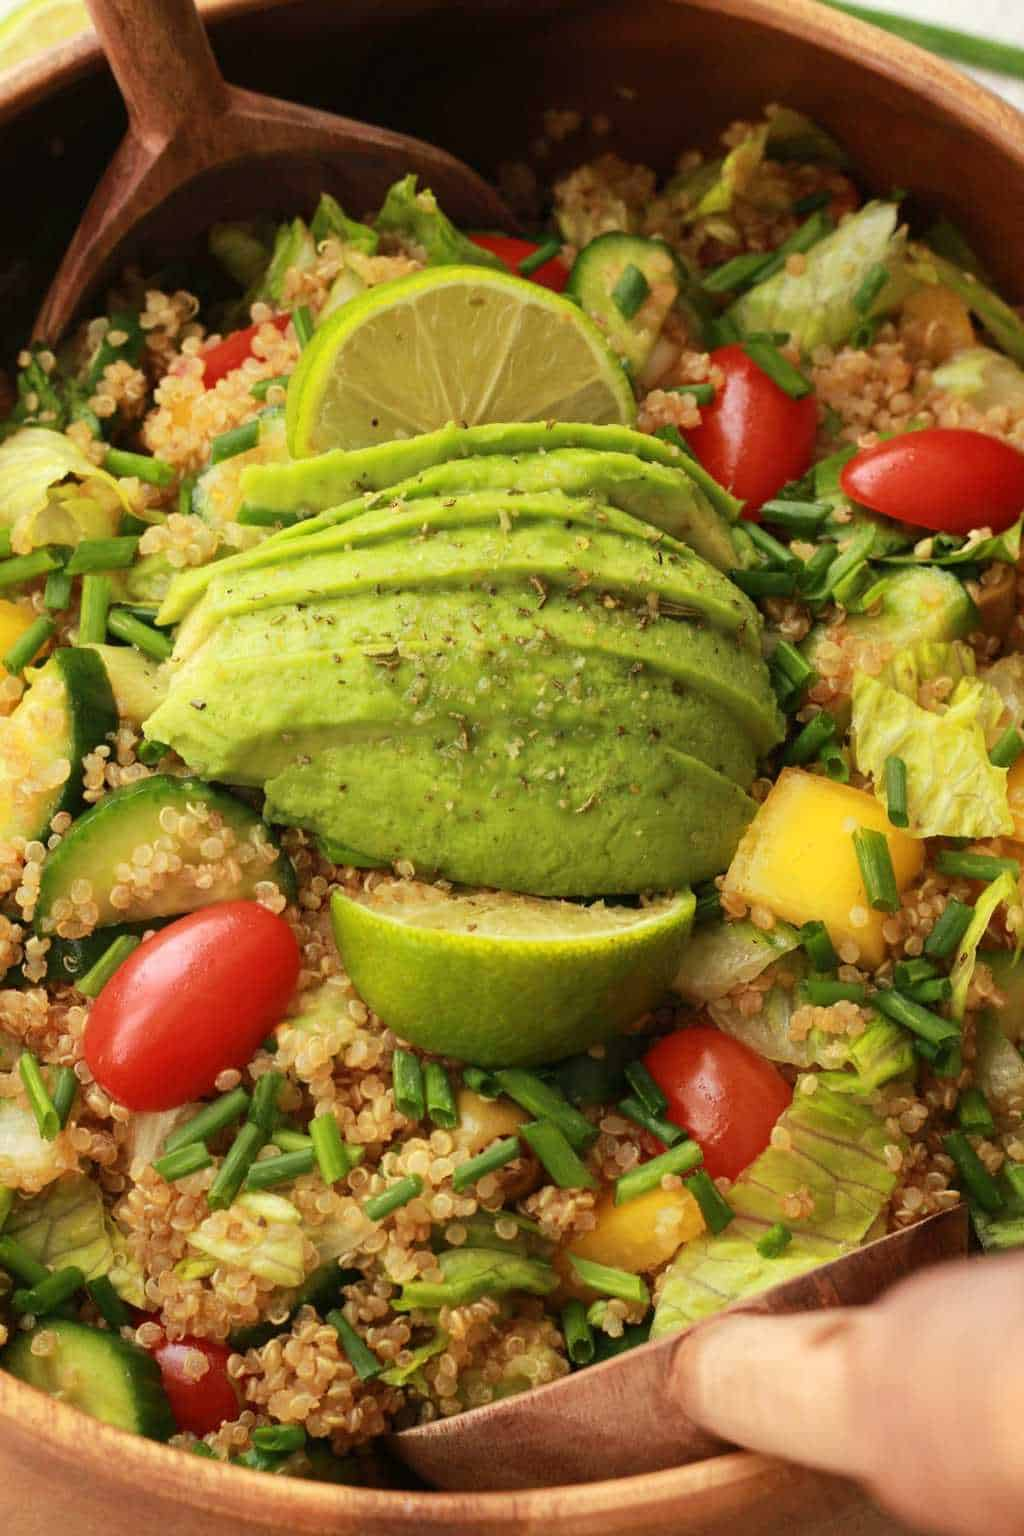 Fabulously healthy Quinoa Salad with Sesame Soy Dressing. Vegan and Gluten-free! #vegan #lovingitvegan #glutenfree #quinoasalad #entree